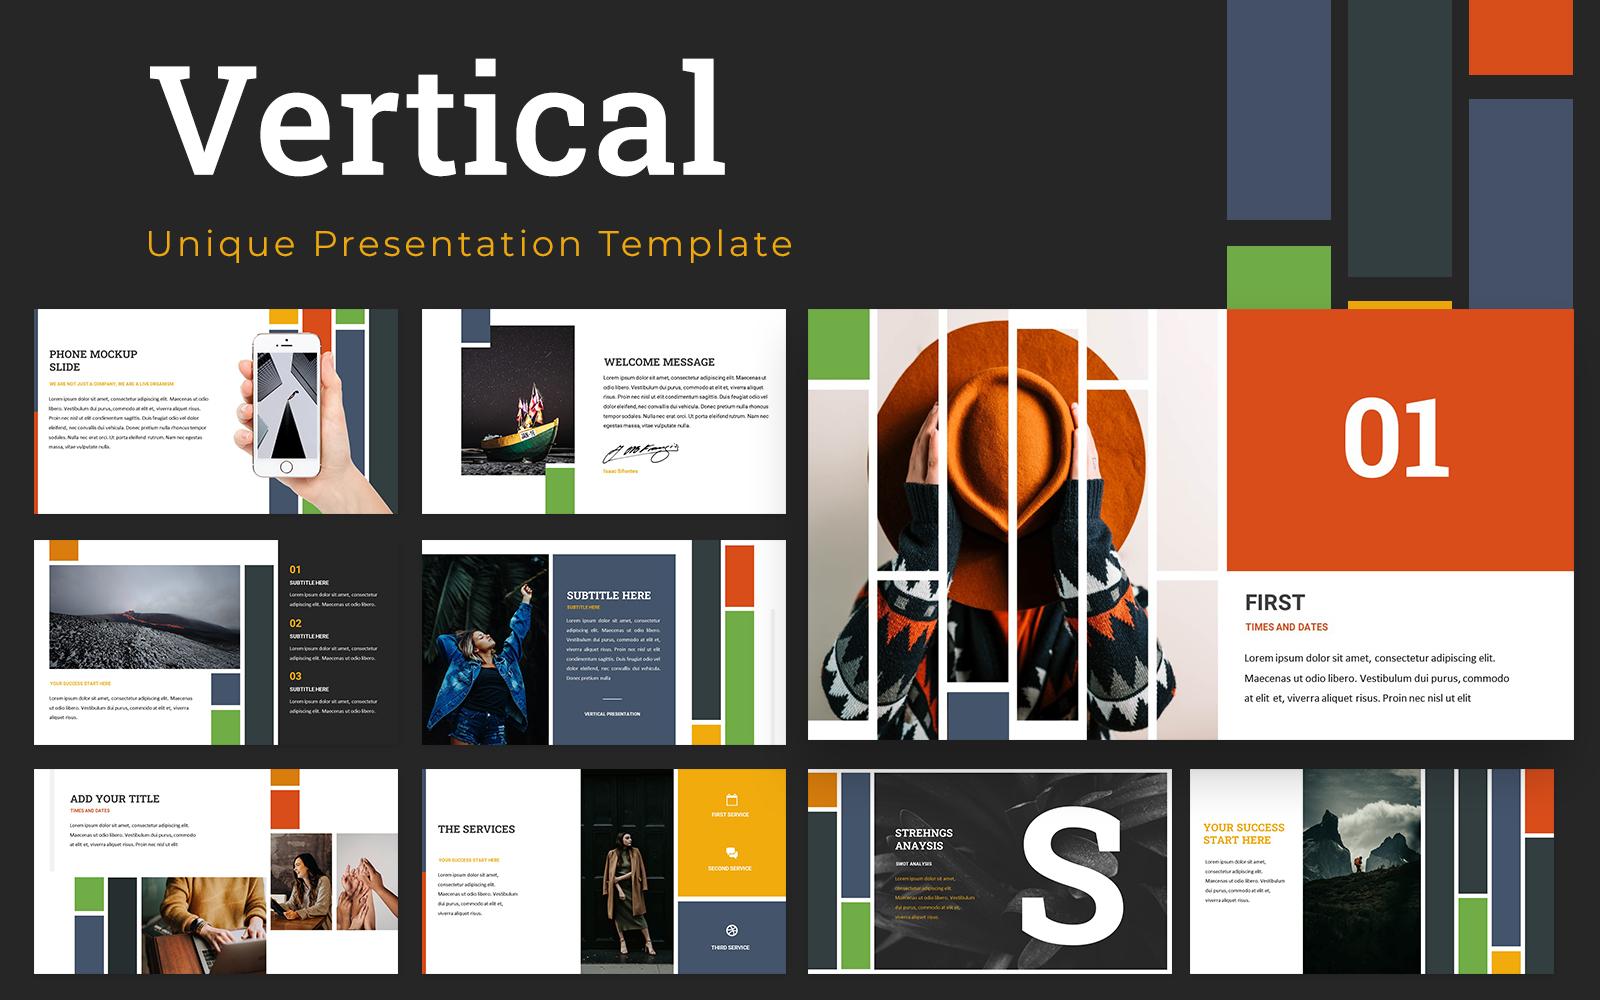 Vertical Powerpoint Presentation Template